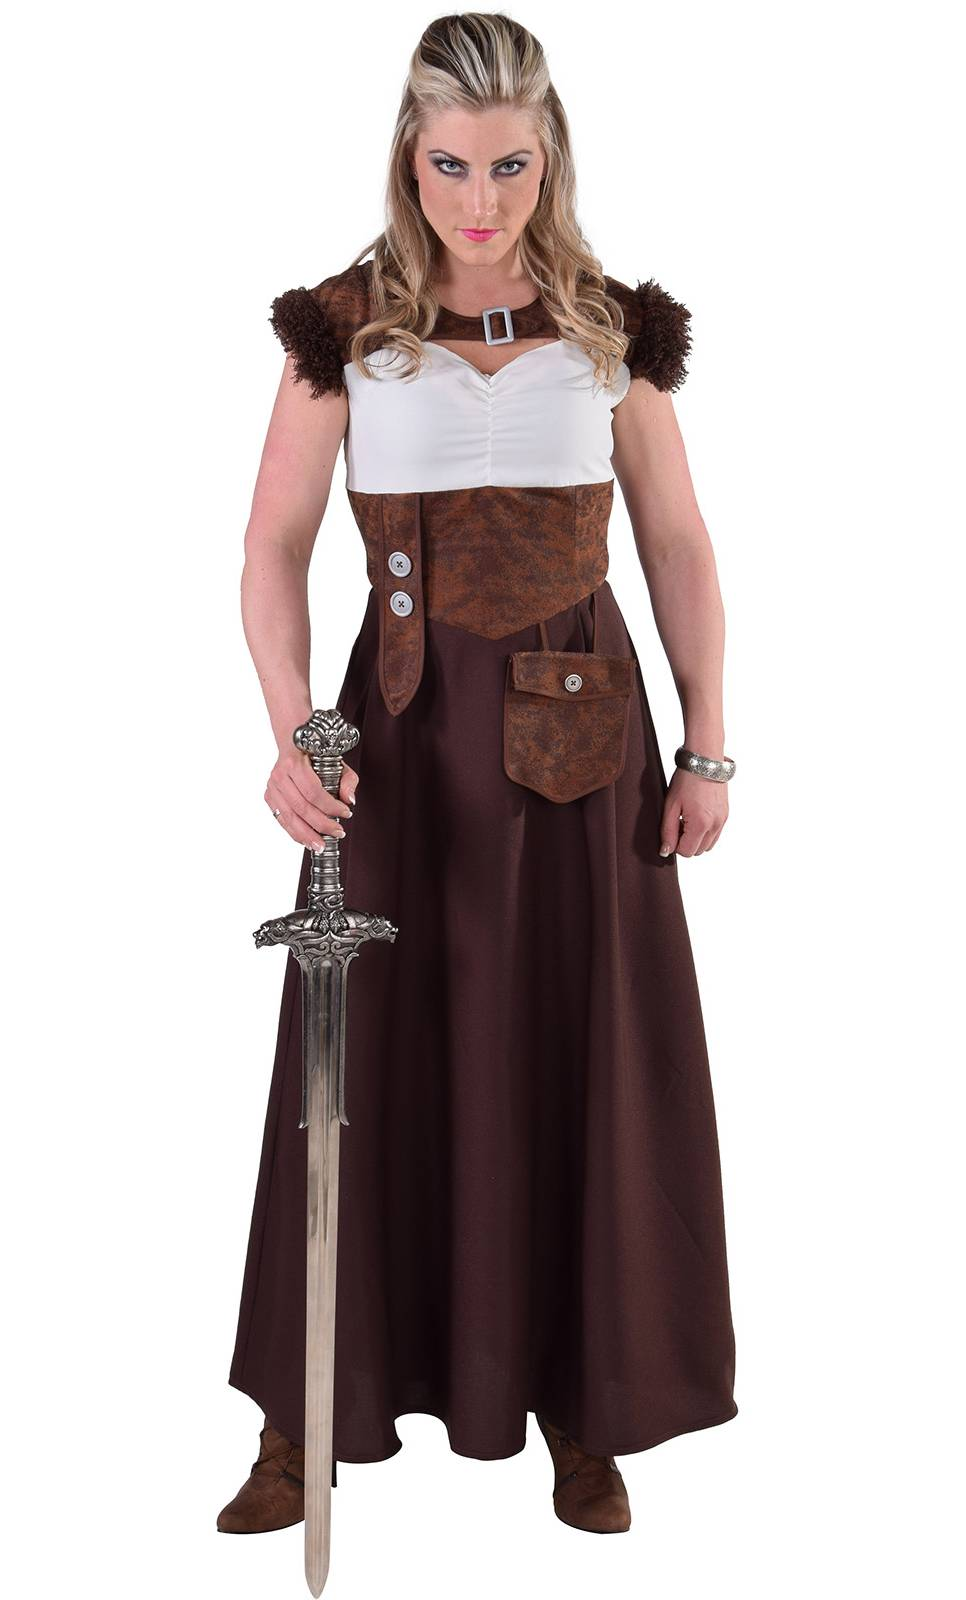 Costume viking femme grande taille xl-xxl